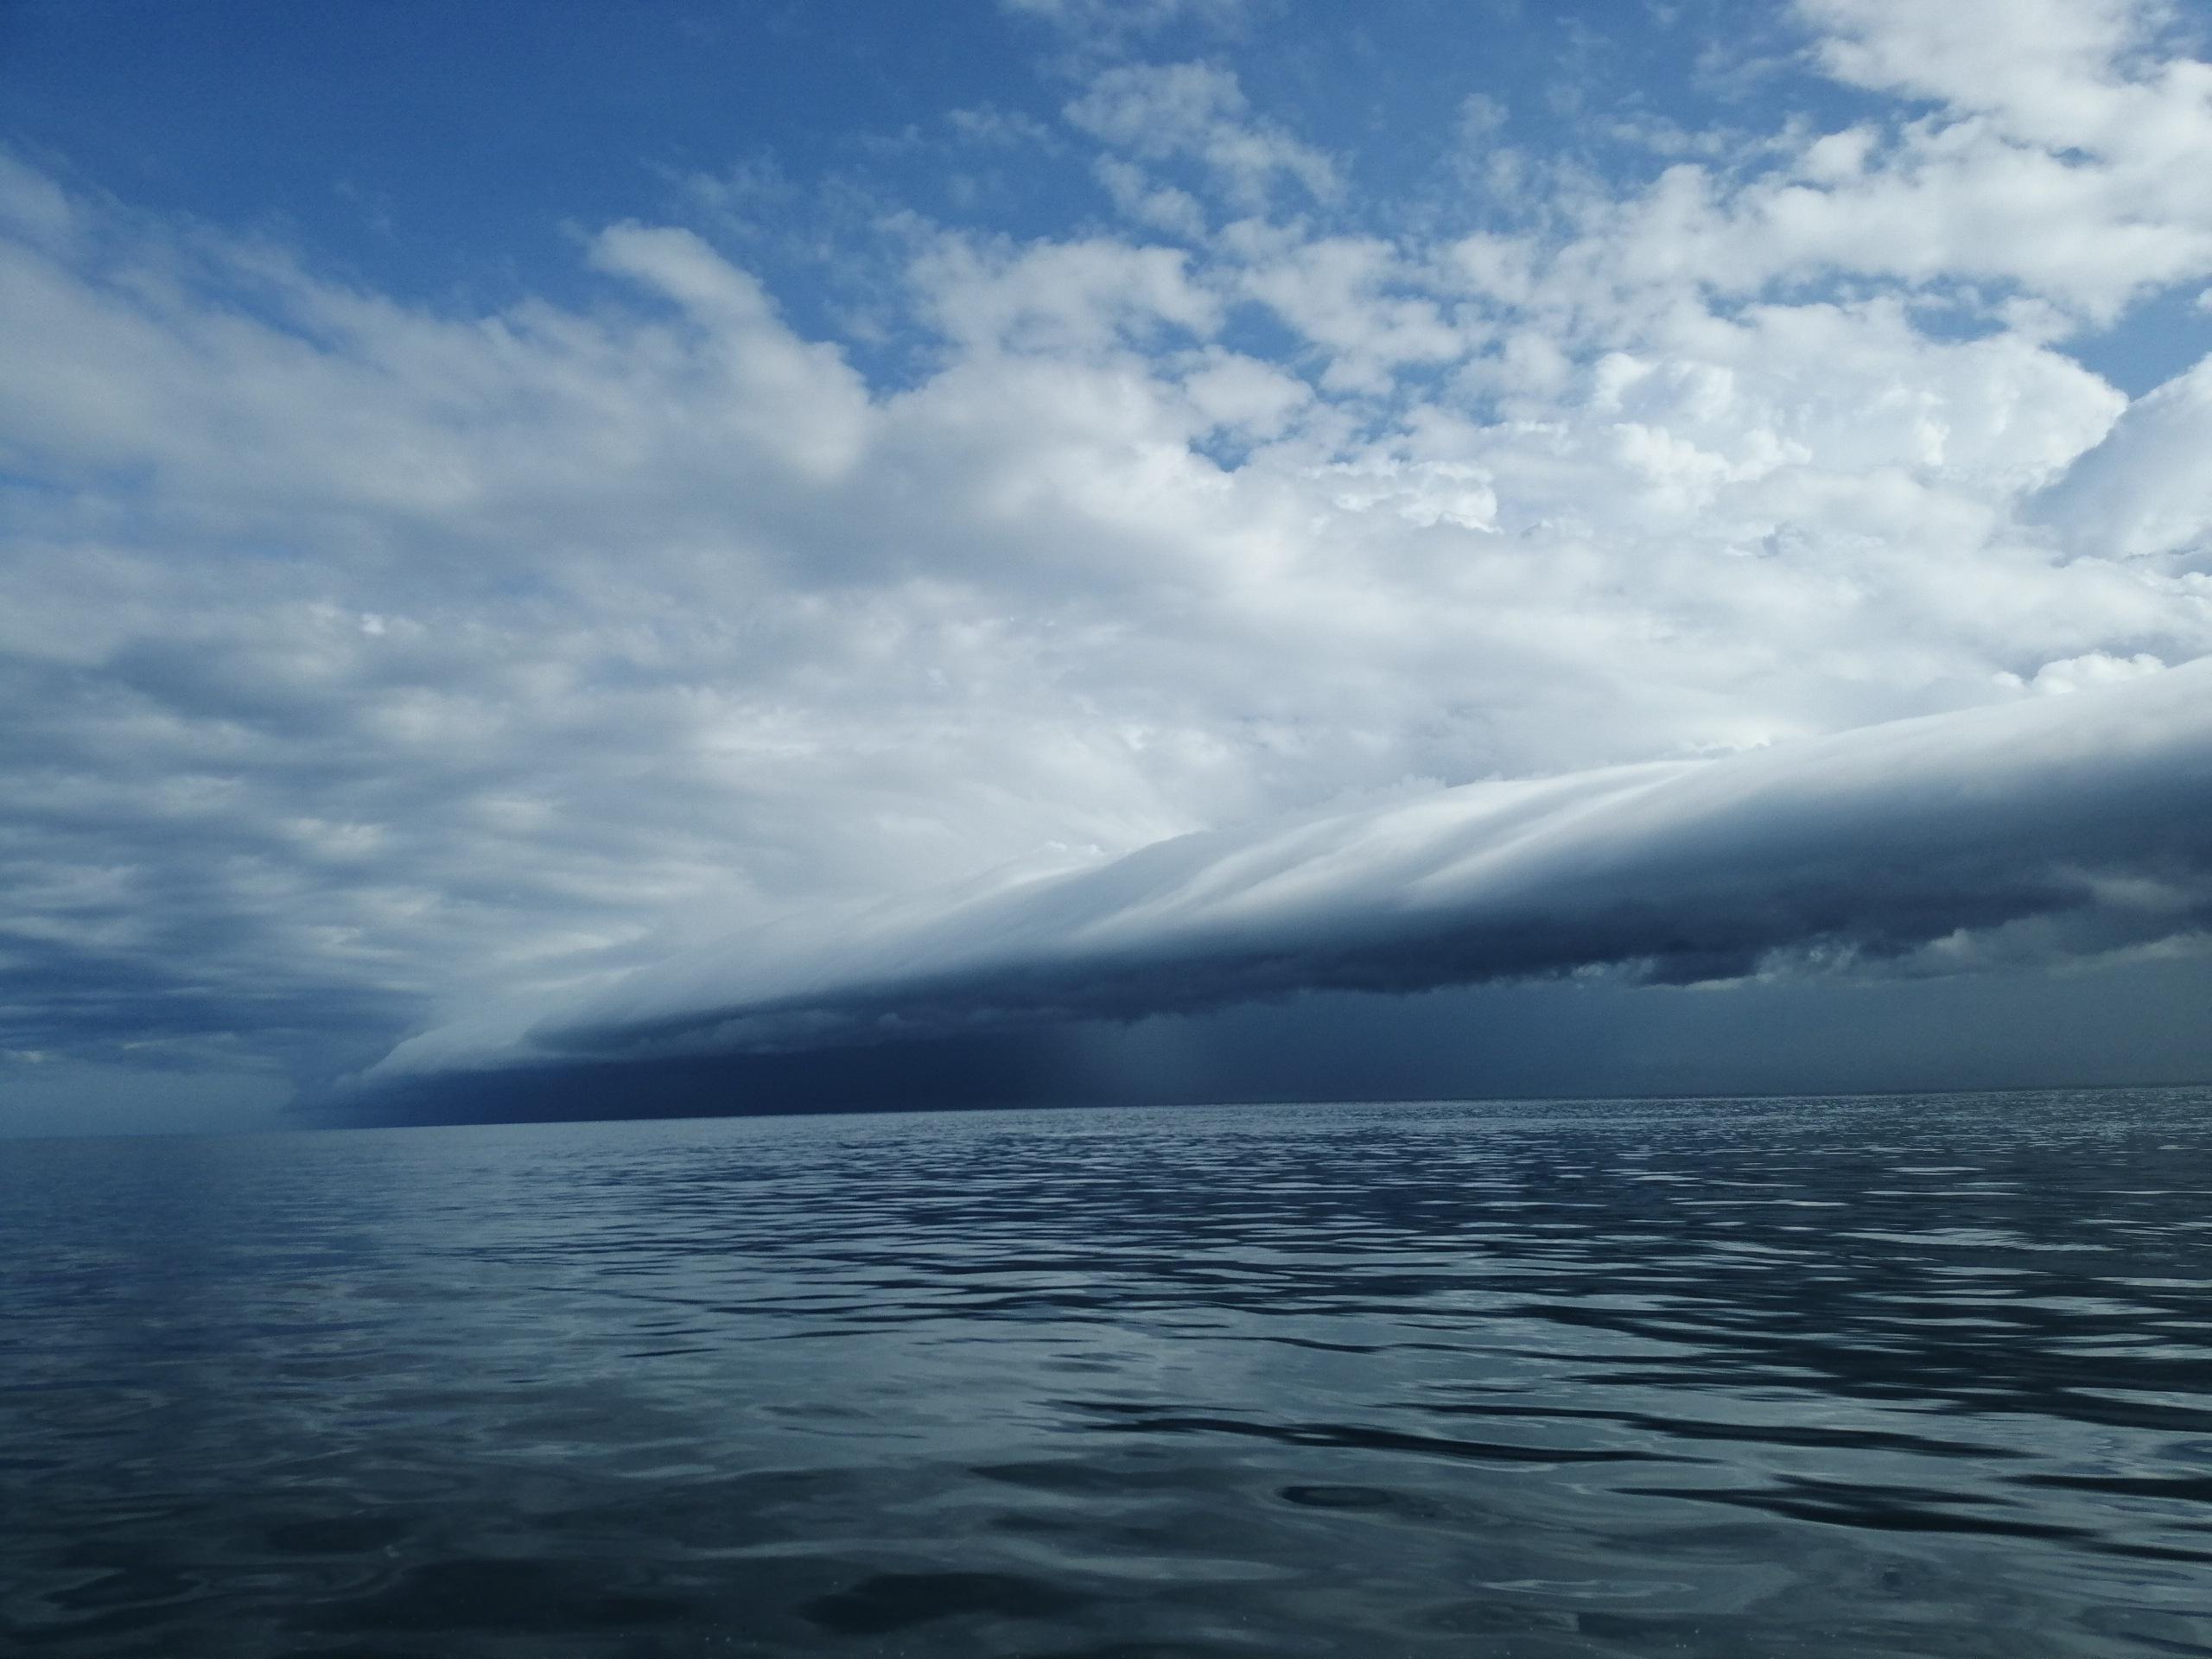 Wet Season Storm Clouds March 2019